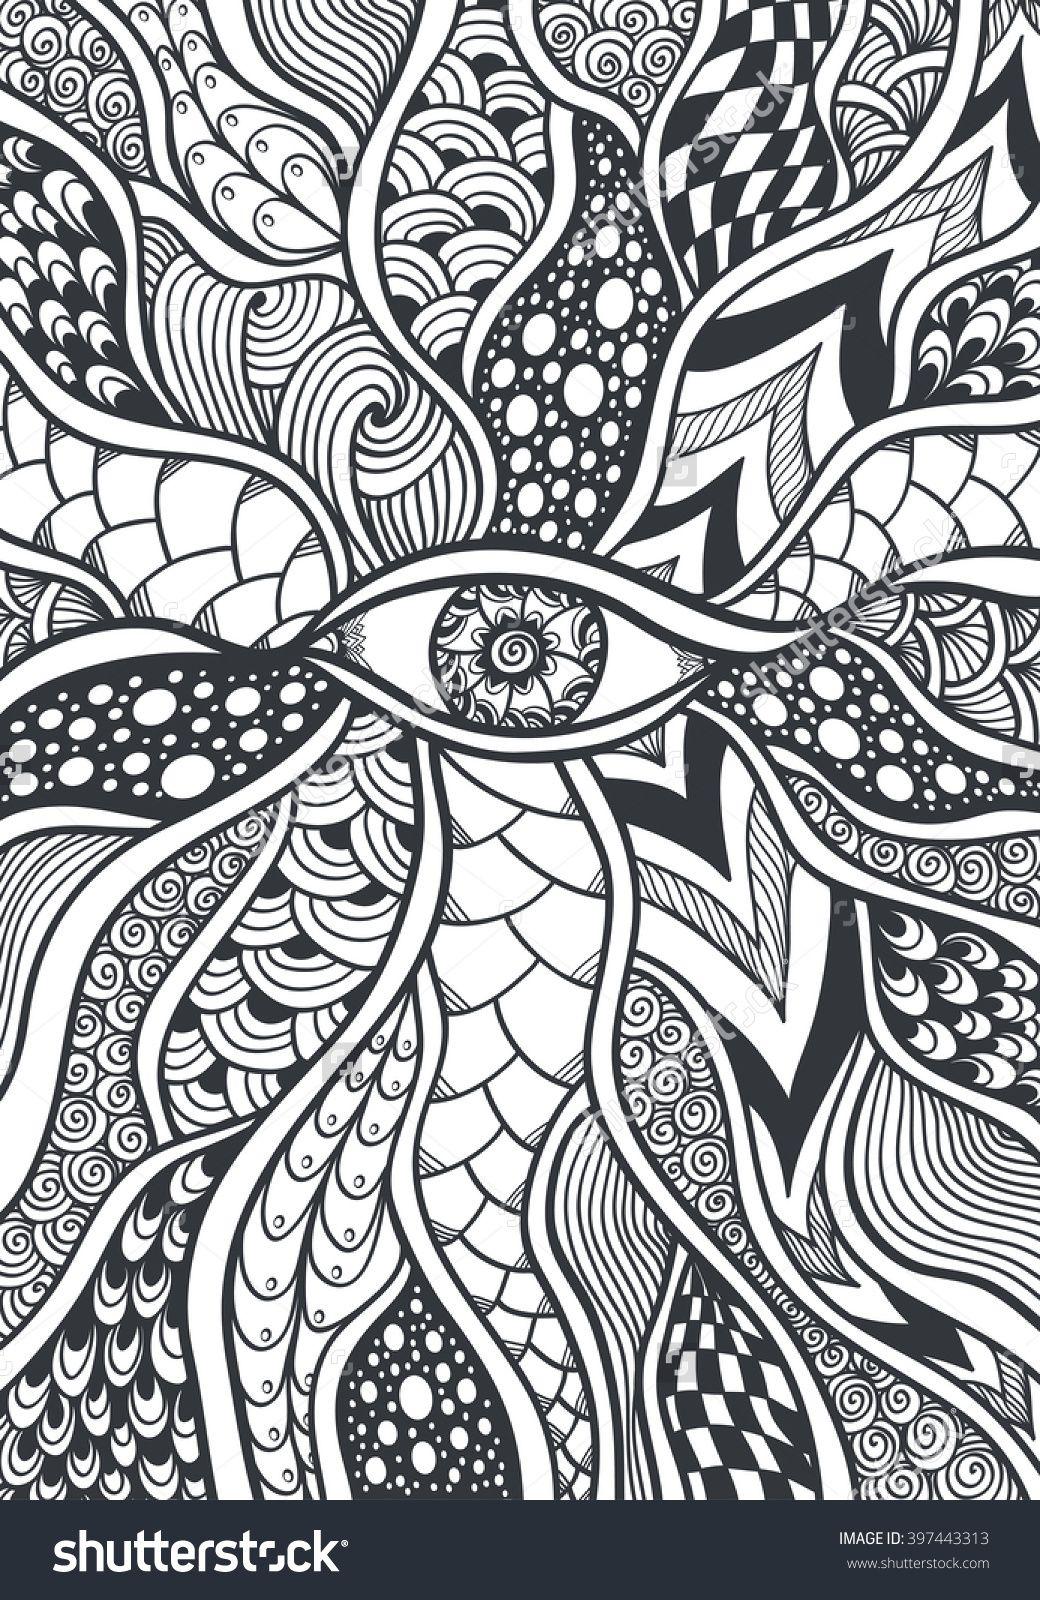 Zen Doodle Eye Coloring Page 397443313 Shutterstock Doodle Art